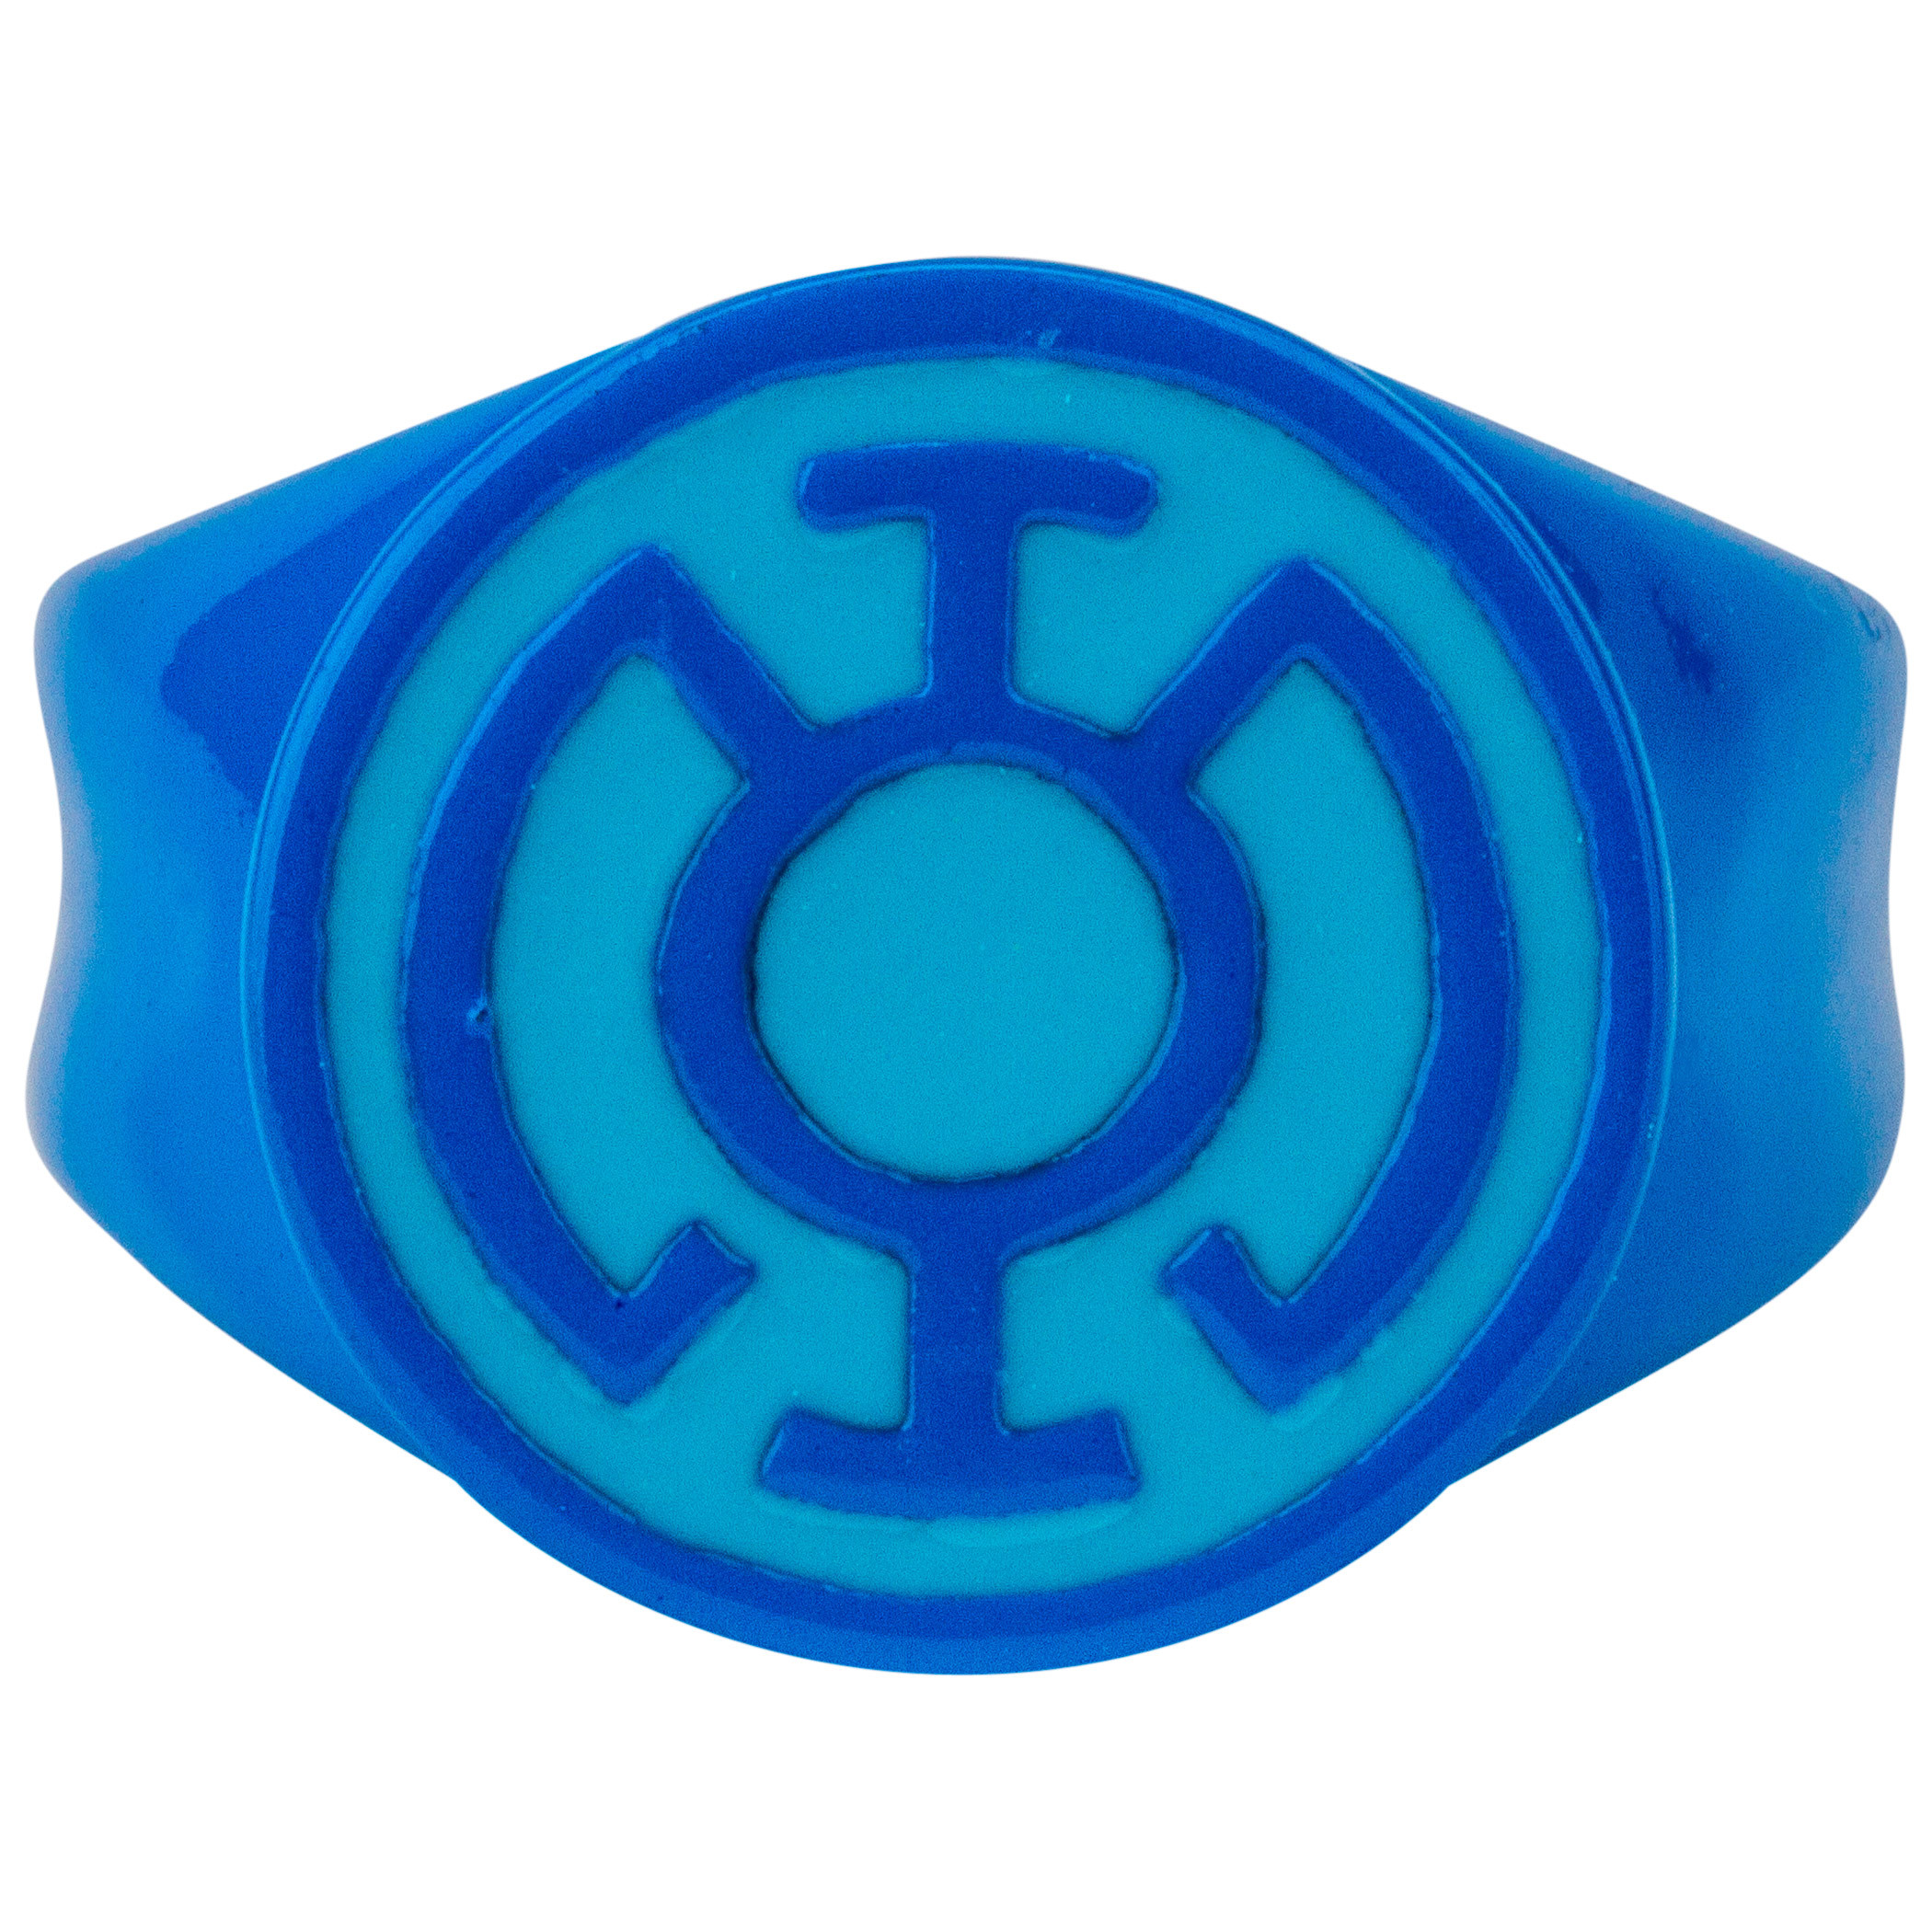 Blue Lantern Blue on Blue Ring